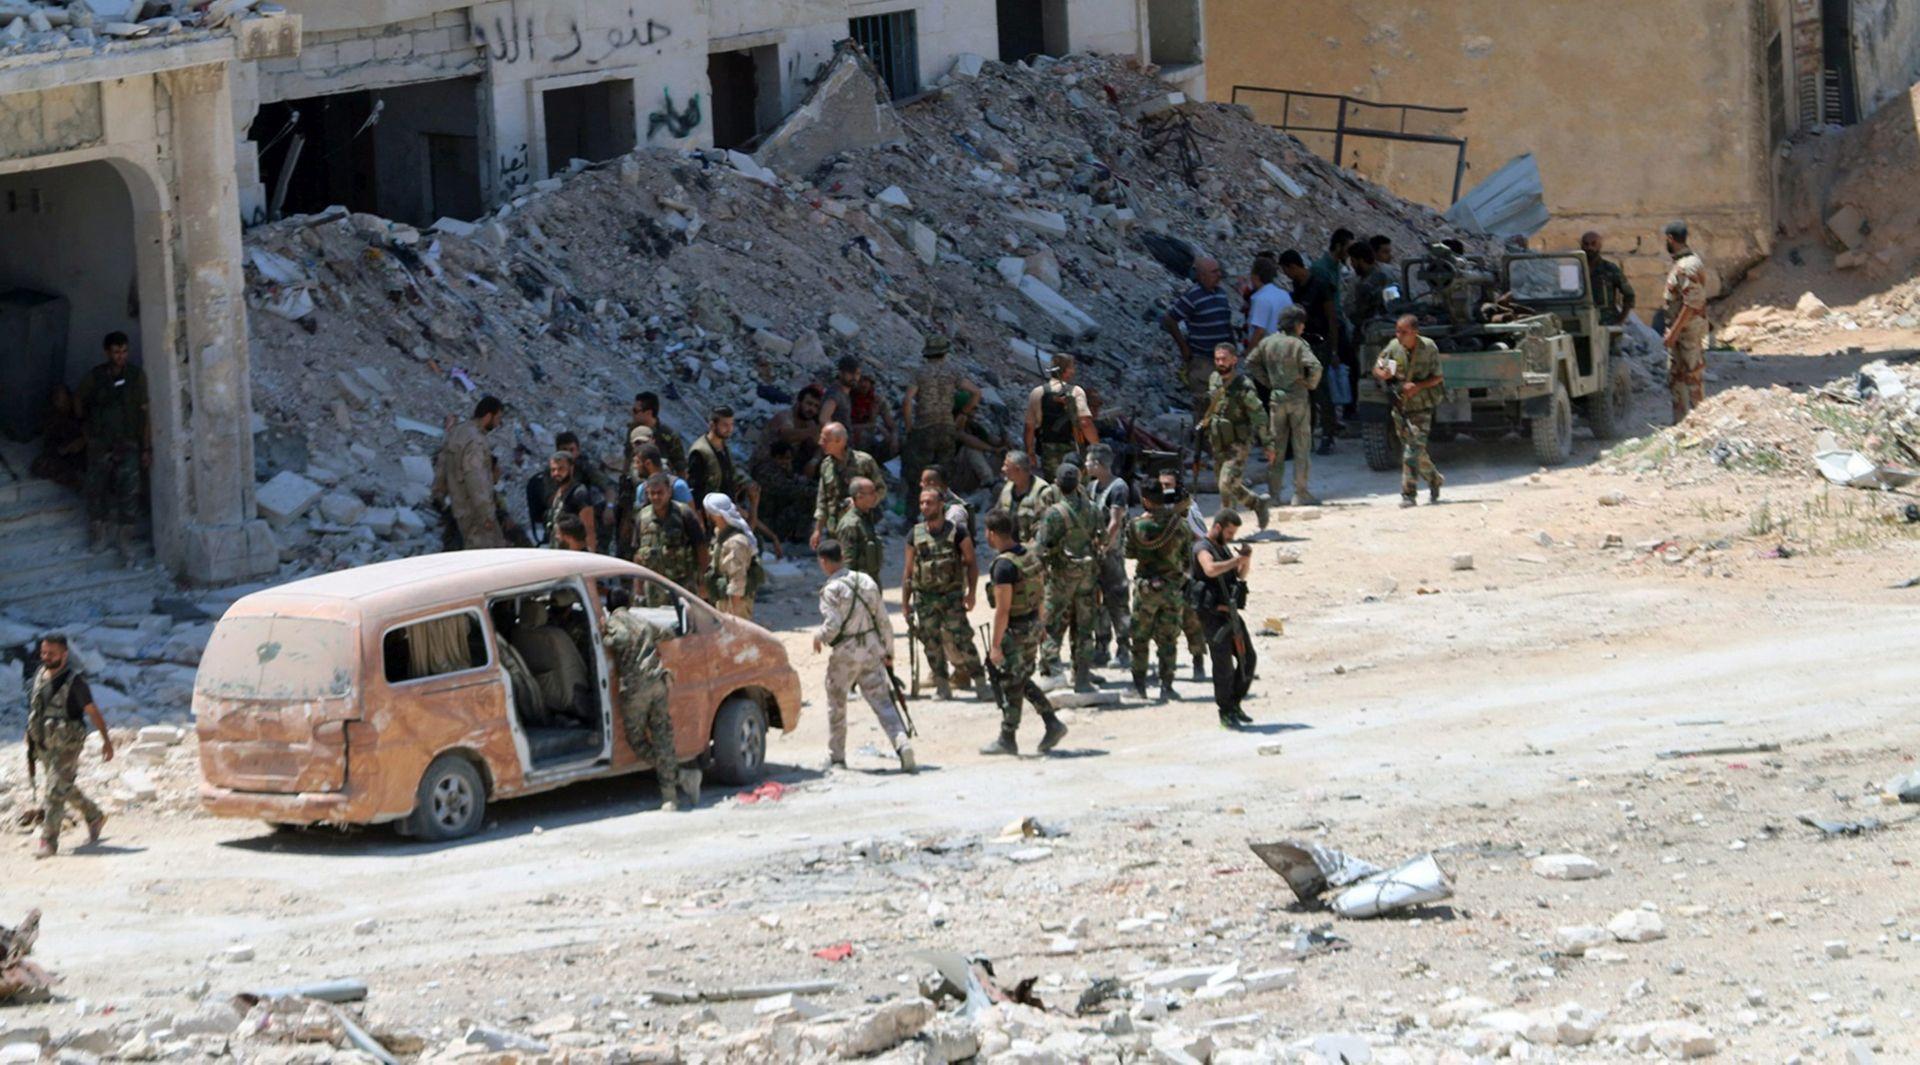 ISKLJUČENA IZ SPORAZUMA O PRIMIRJU: Fronta Nusra preimenovala se u Jabhat Fatah al Sham